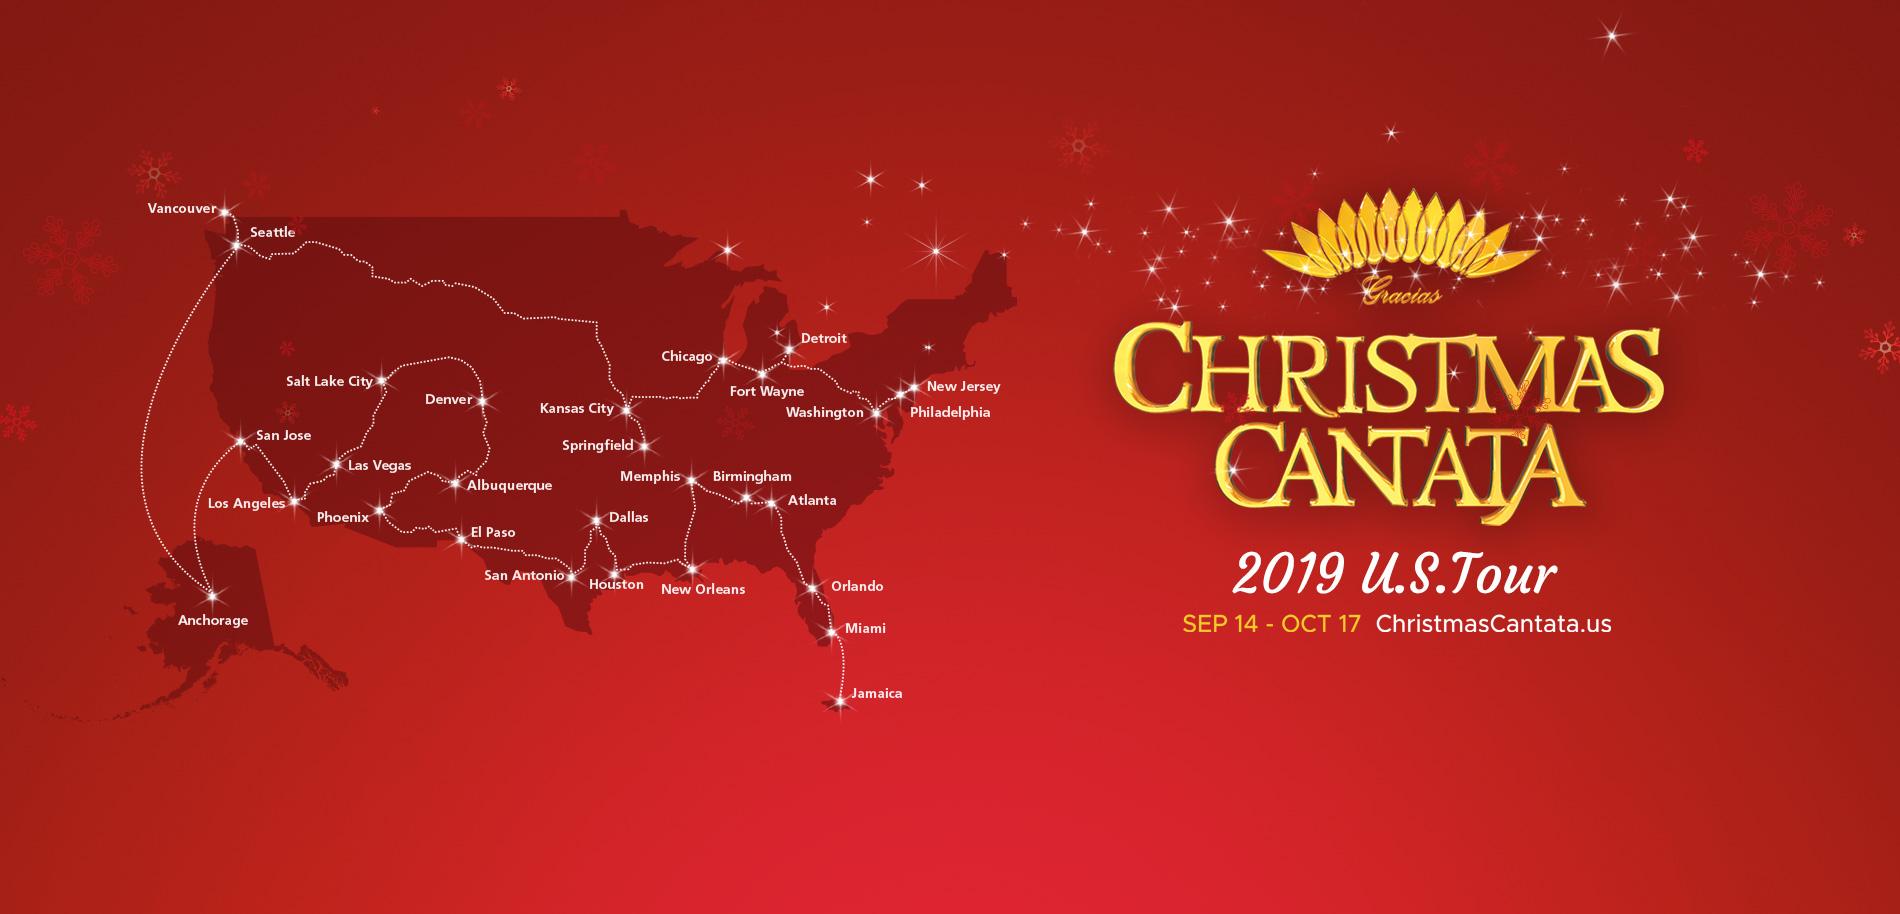 Christmas Concerts 2019 Los Angeles.Gracias Choir Official Website